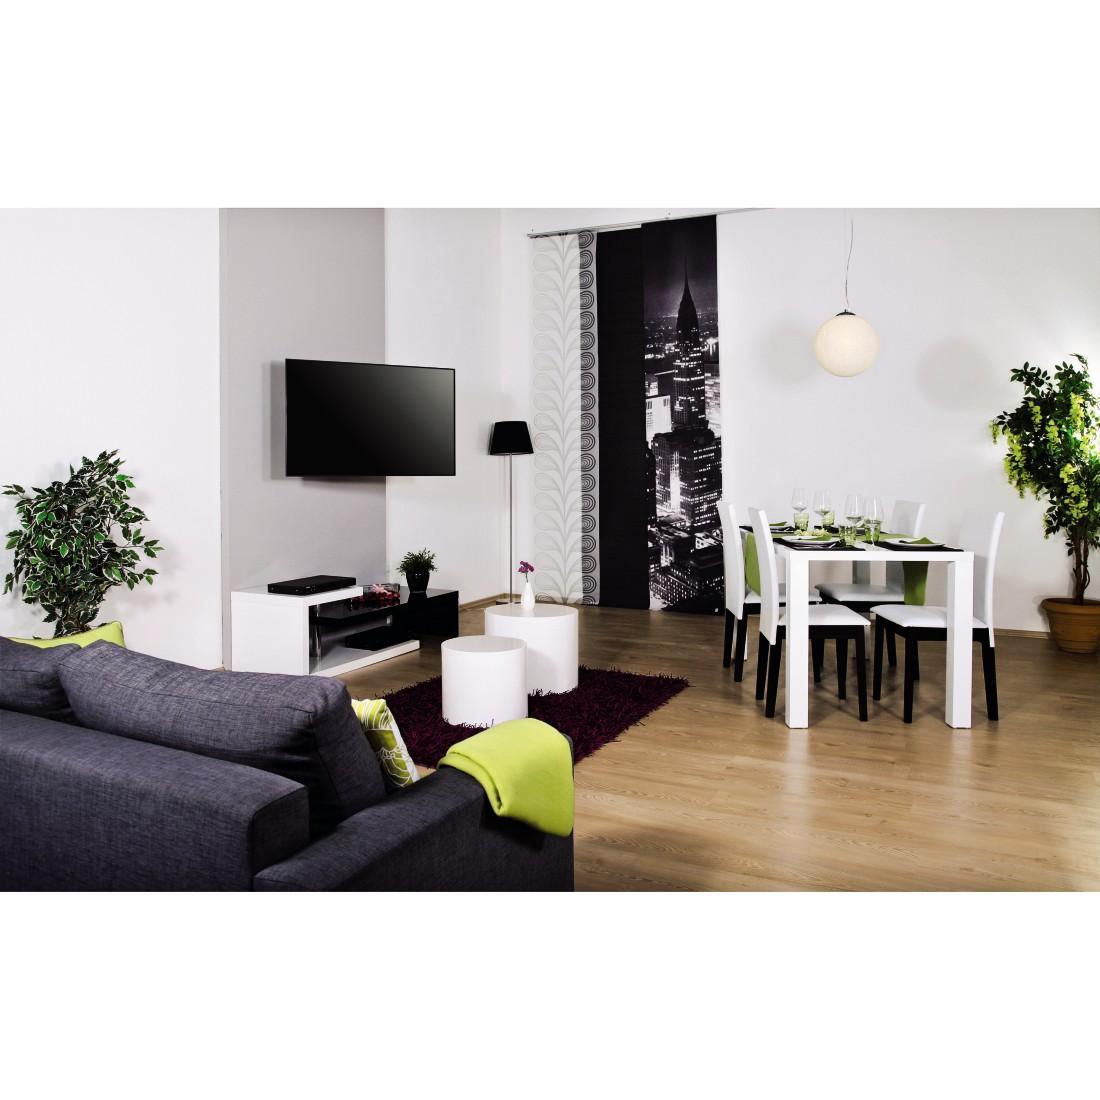 hama tv wandhalterung f r gro e fernseher bis 90 zoll 119. Black Bedroom Furniture Sets. Home Design Ideas